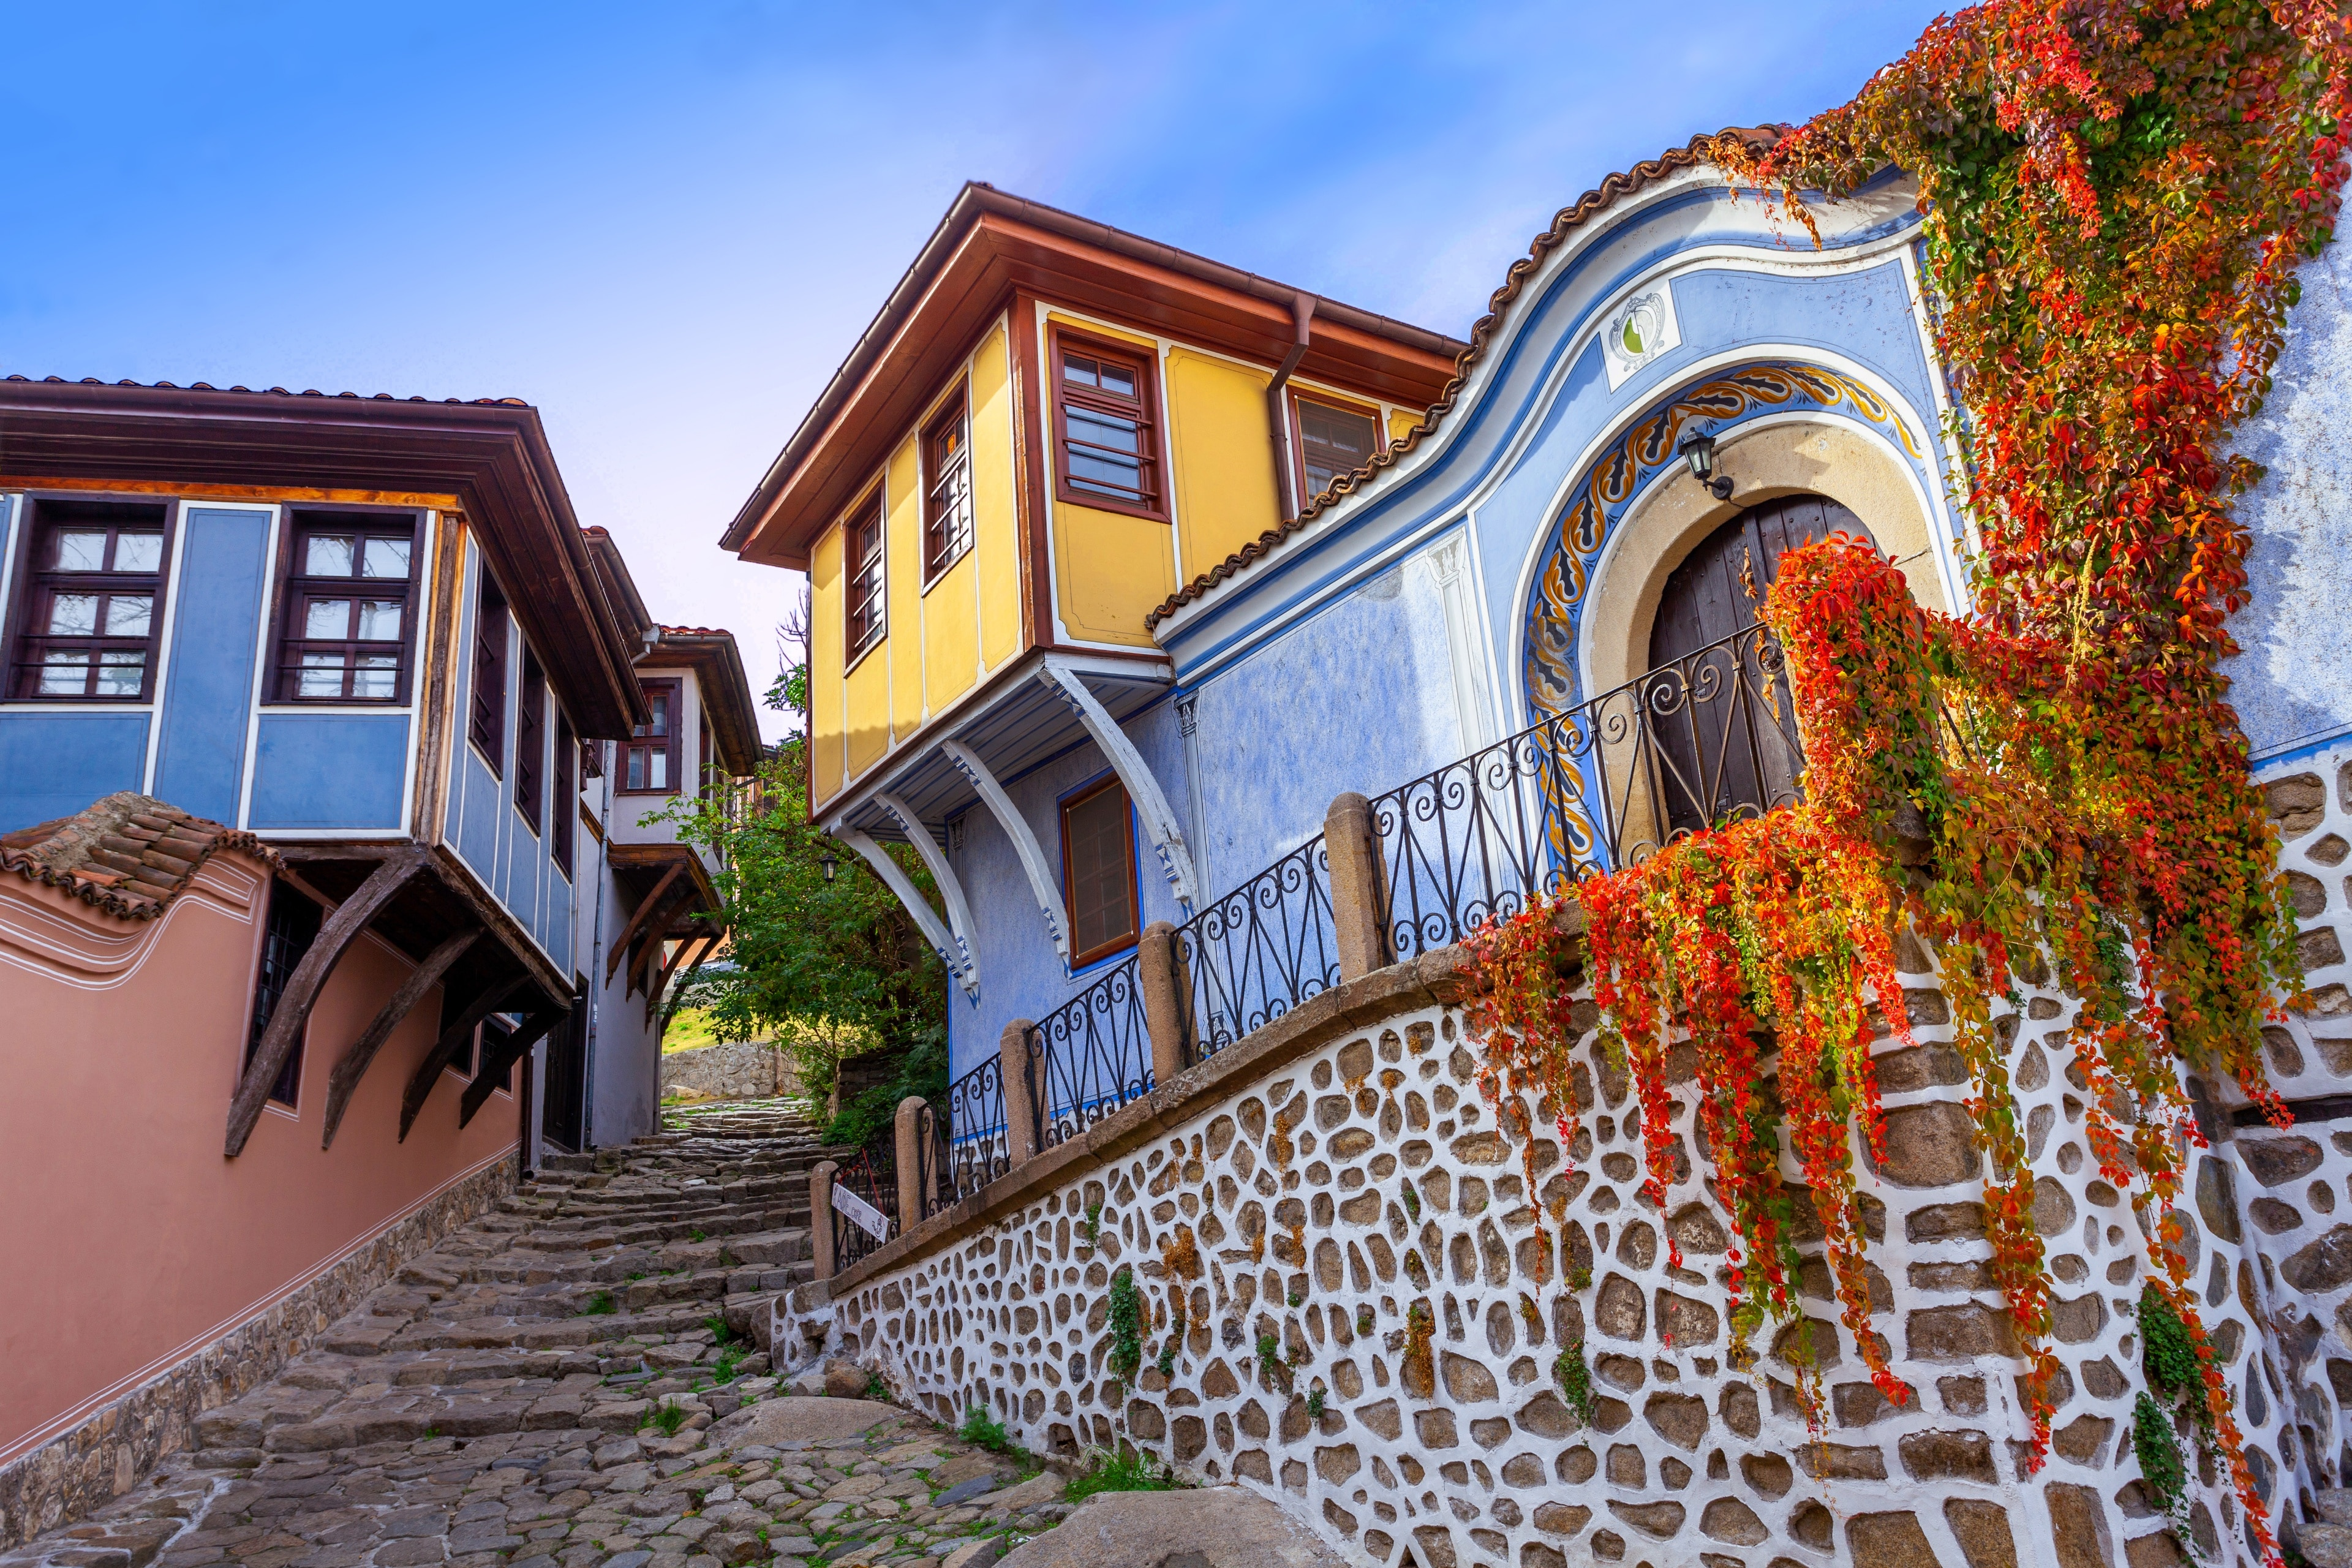 Plovdiv, Plovdiv Province, Bulgaria